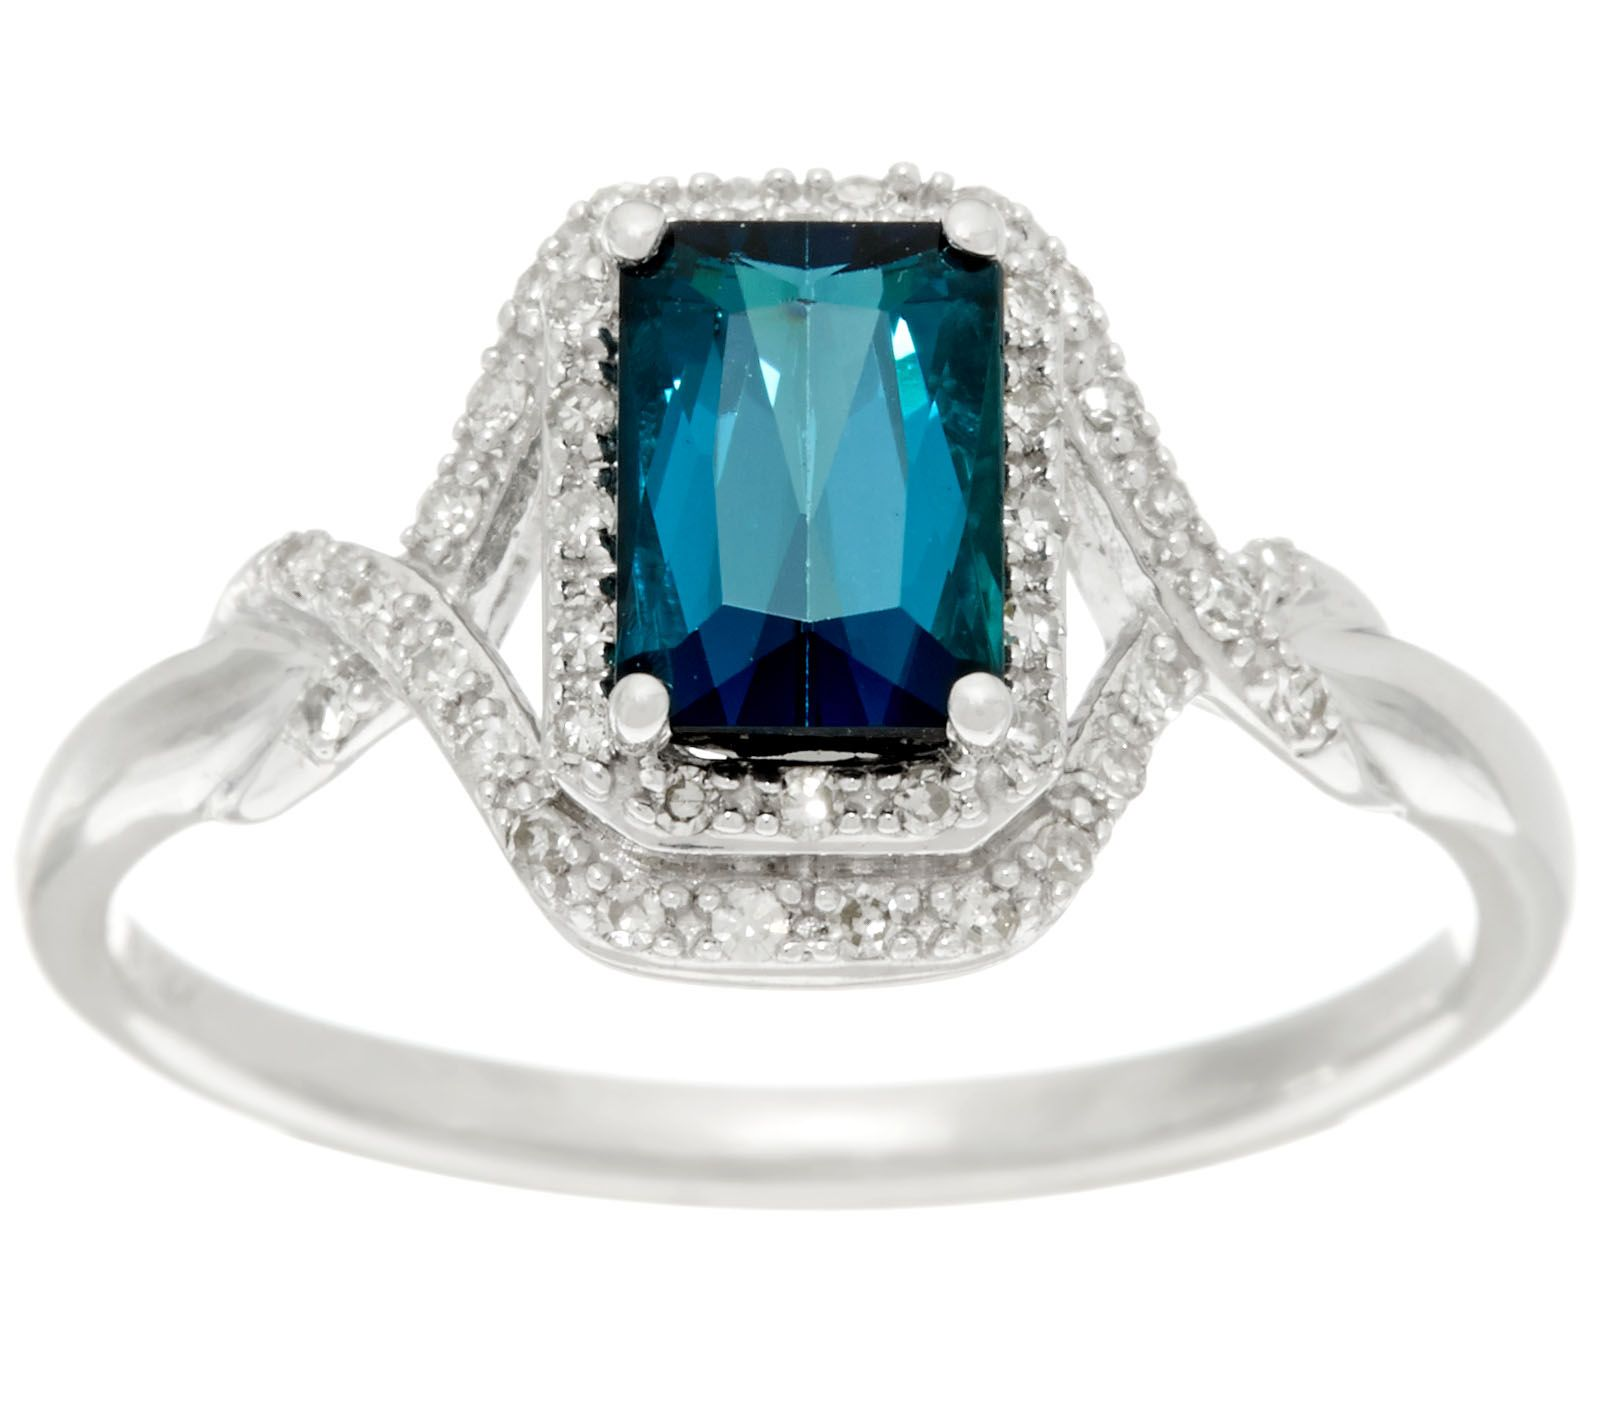 emerald cut blue tourmaline ring 14k gold 1 00